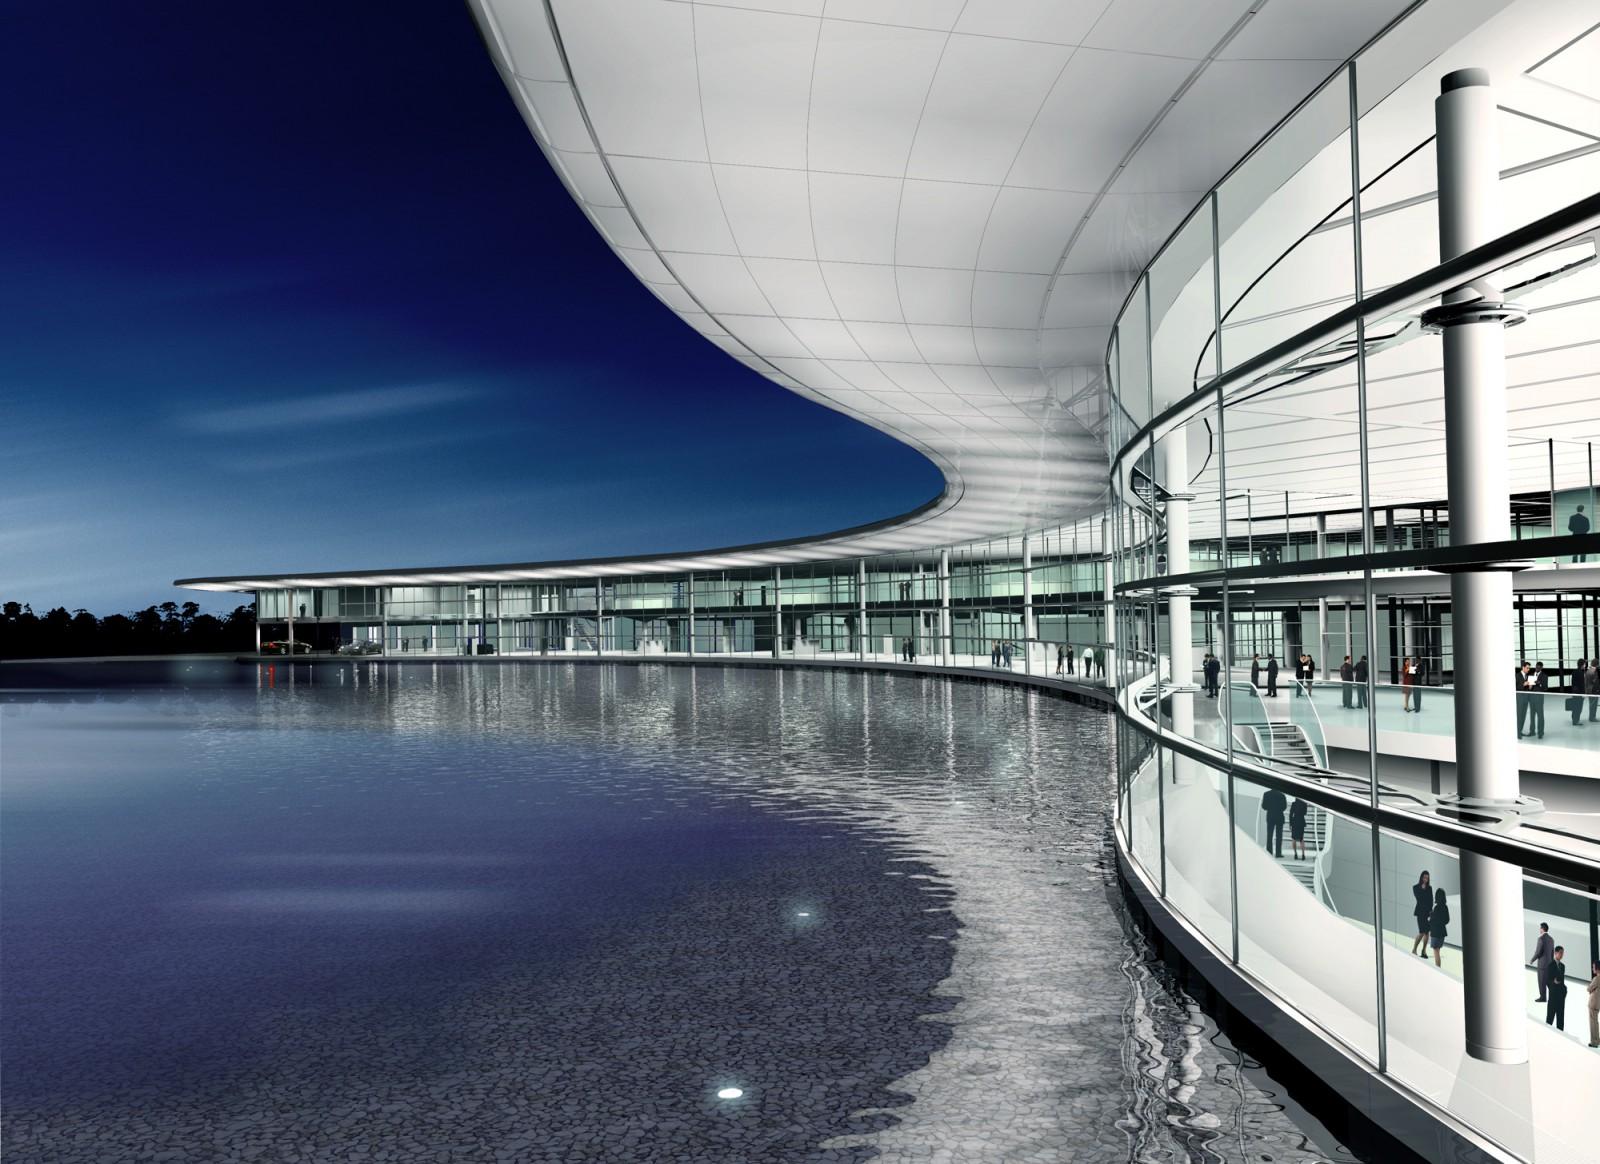 Flashforward - McLaren Technology Centre